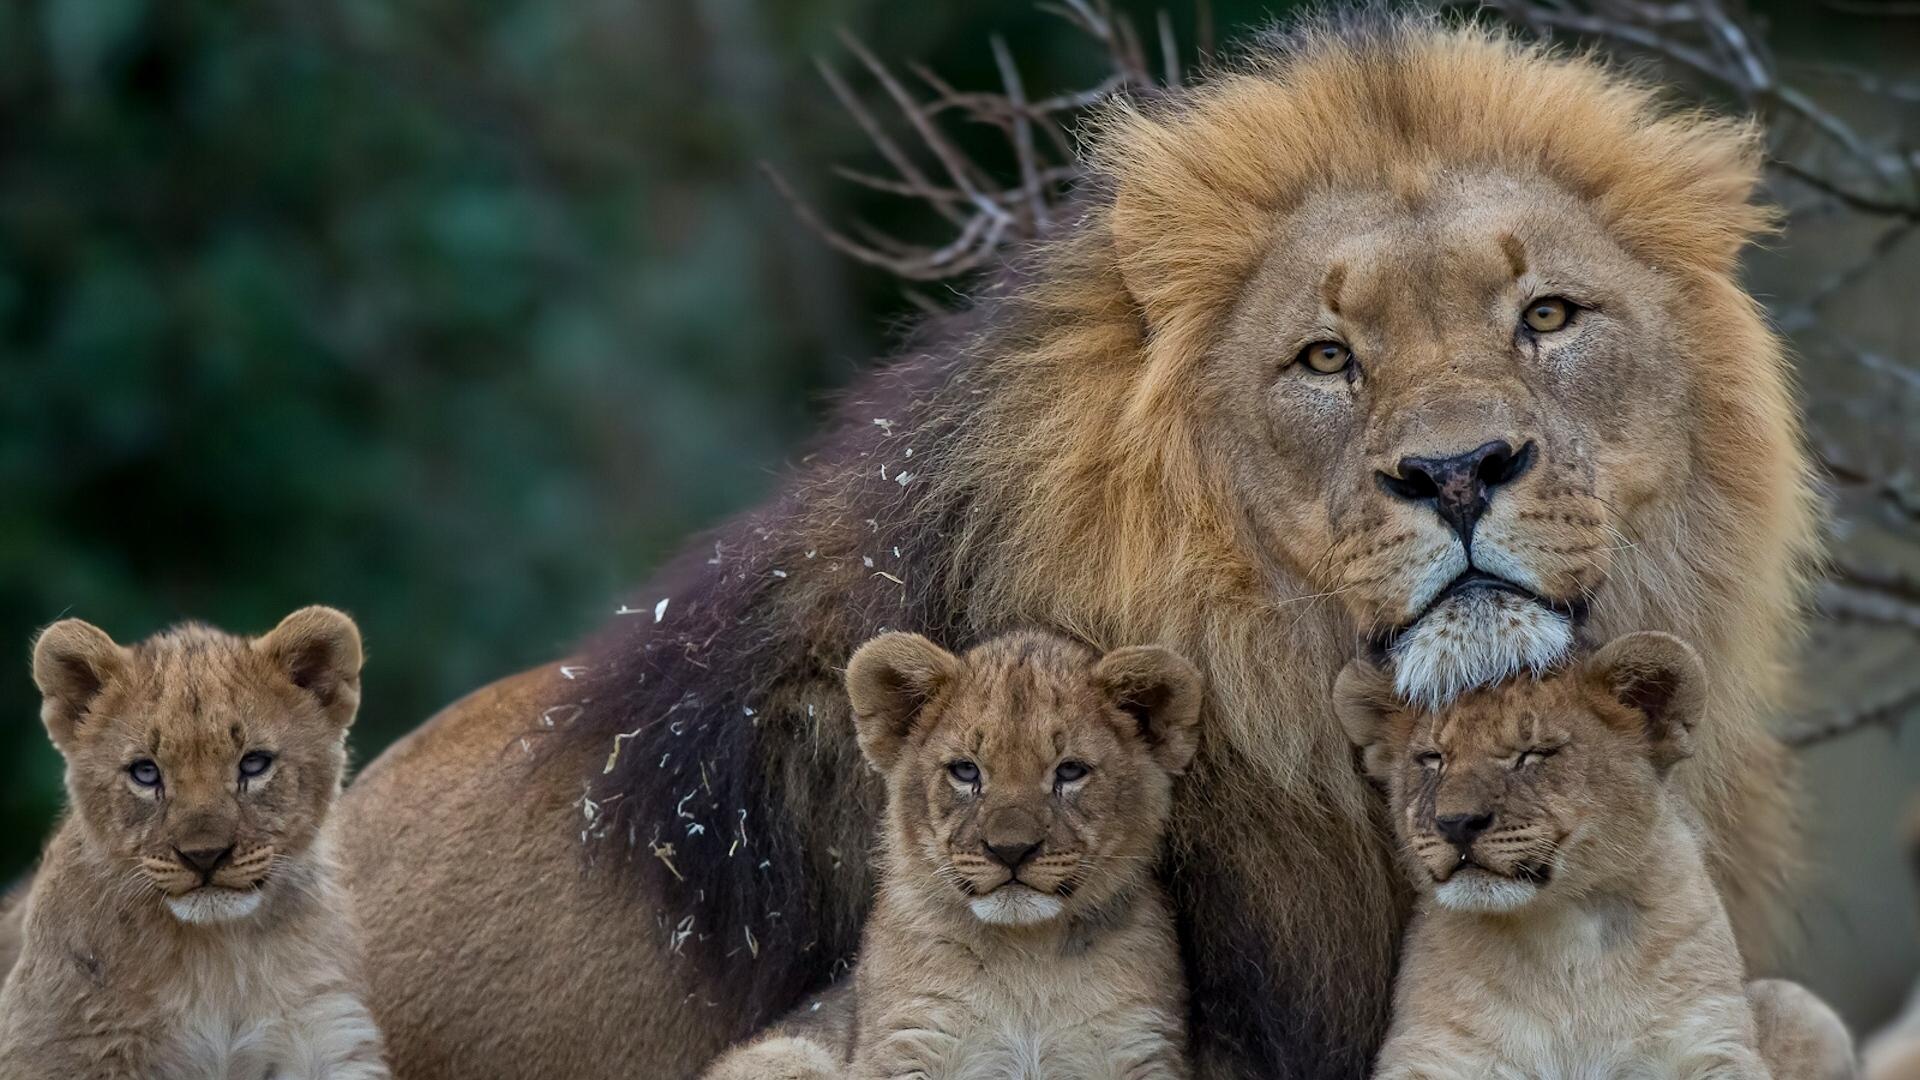 download wallpaper 1920x1080 lion, lioness, young, family, predators